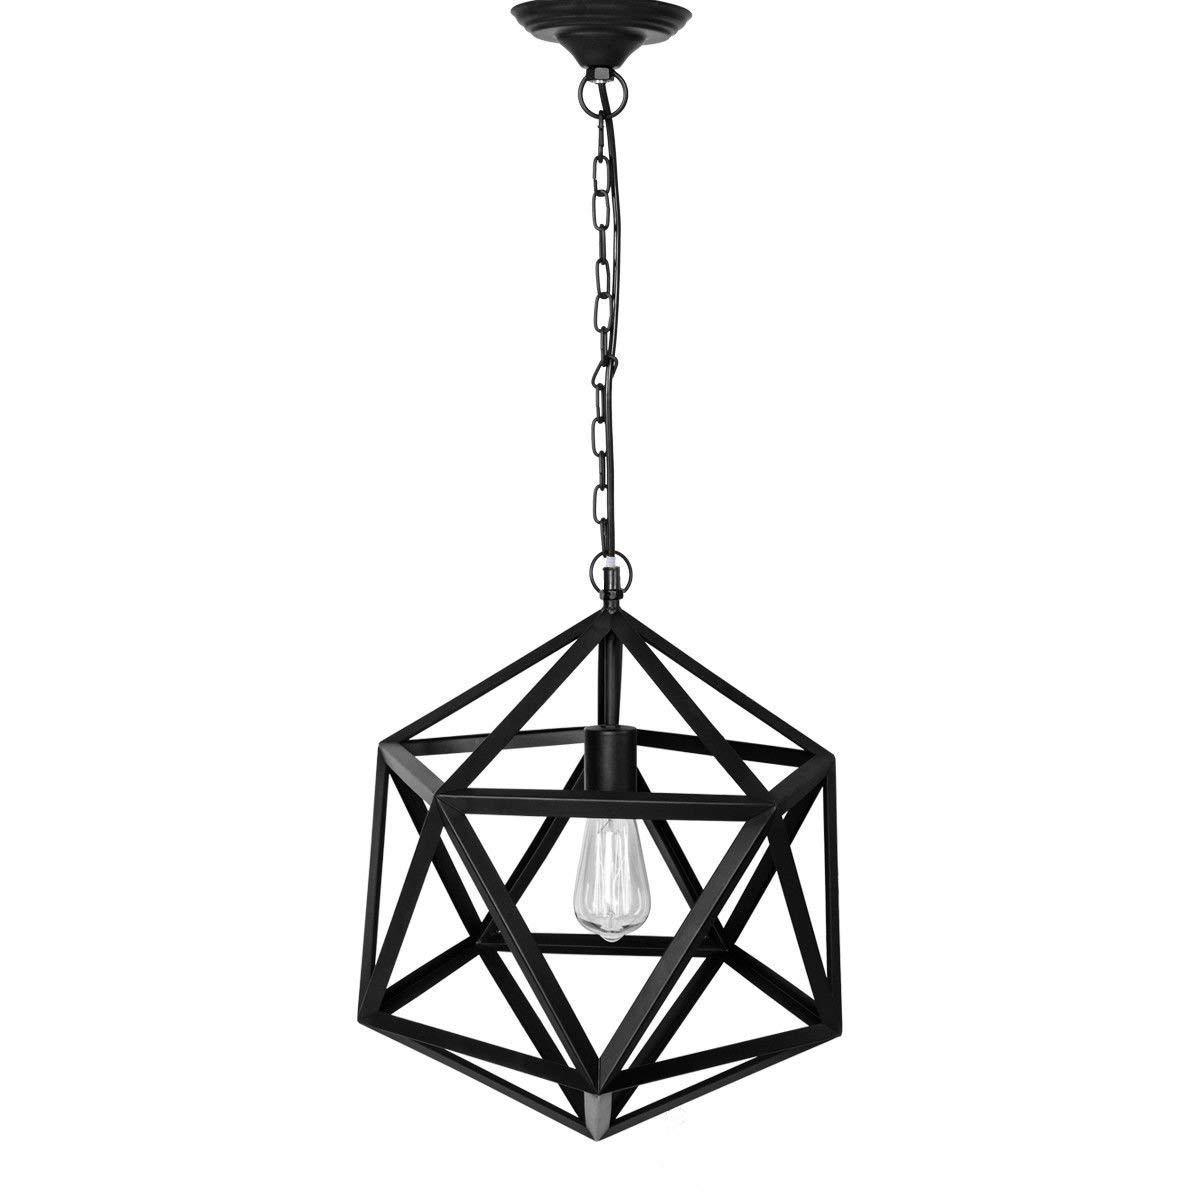 Tangkula Pendant Lighting Vintage Industrial Edison Hanging 1 Light Cage Loft Lamp Guard (Rhombus)